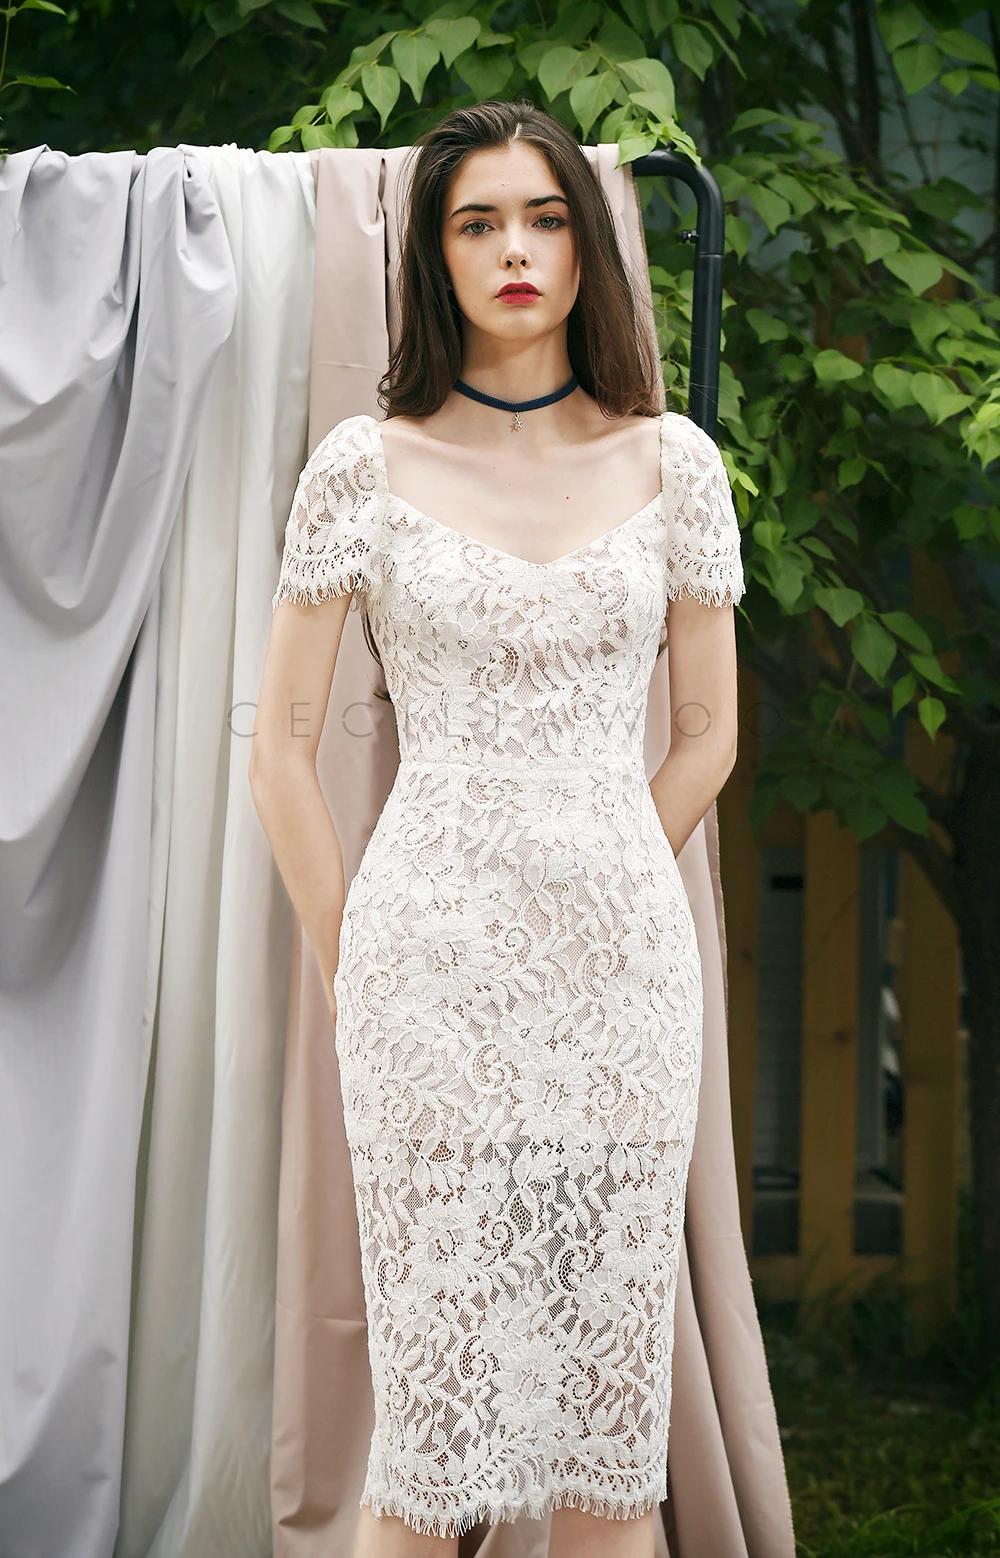 Vintage Style Midi Lace Dress White Lace Midi Dress Dresses Lace Dress [ 1558 x 1000 Pixel ]